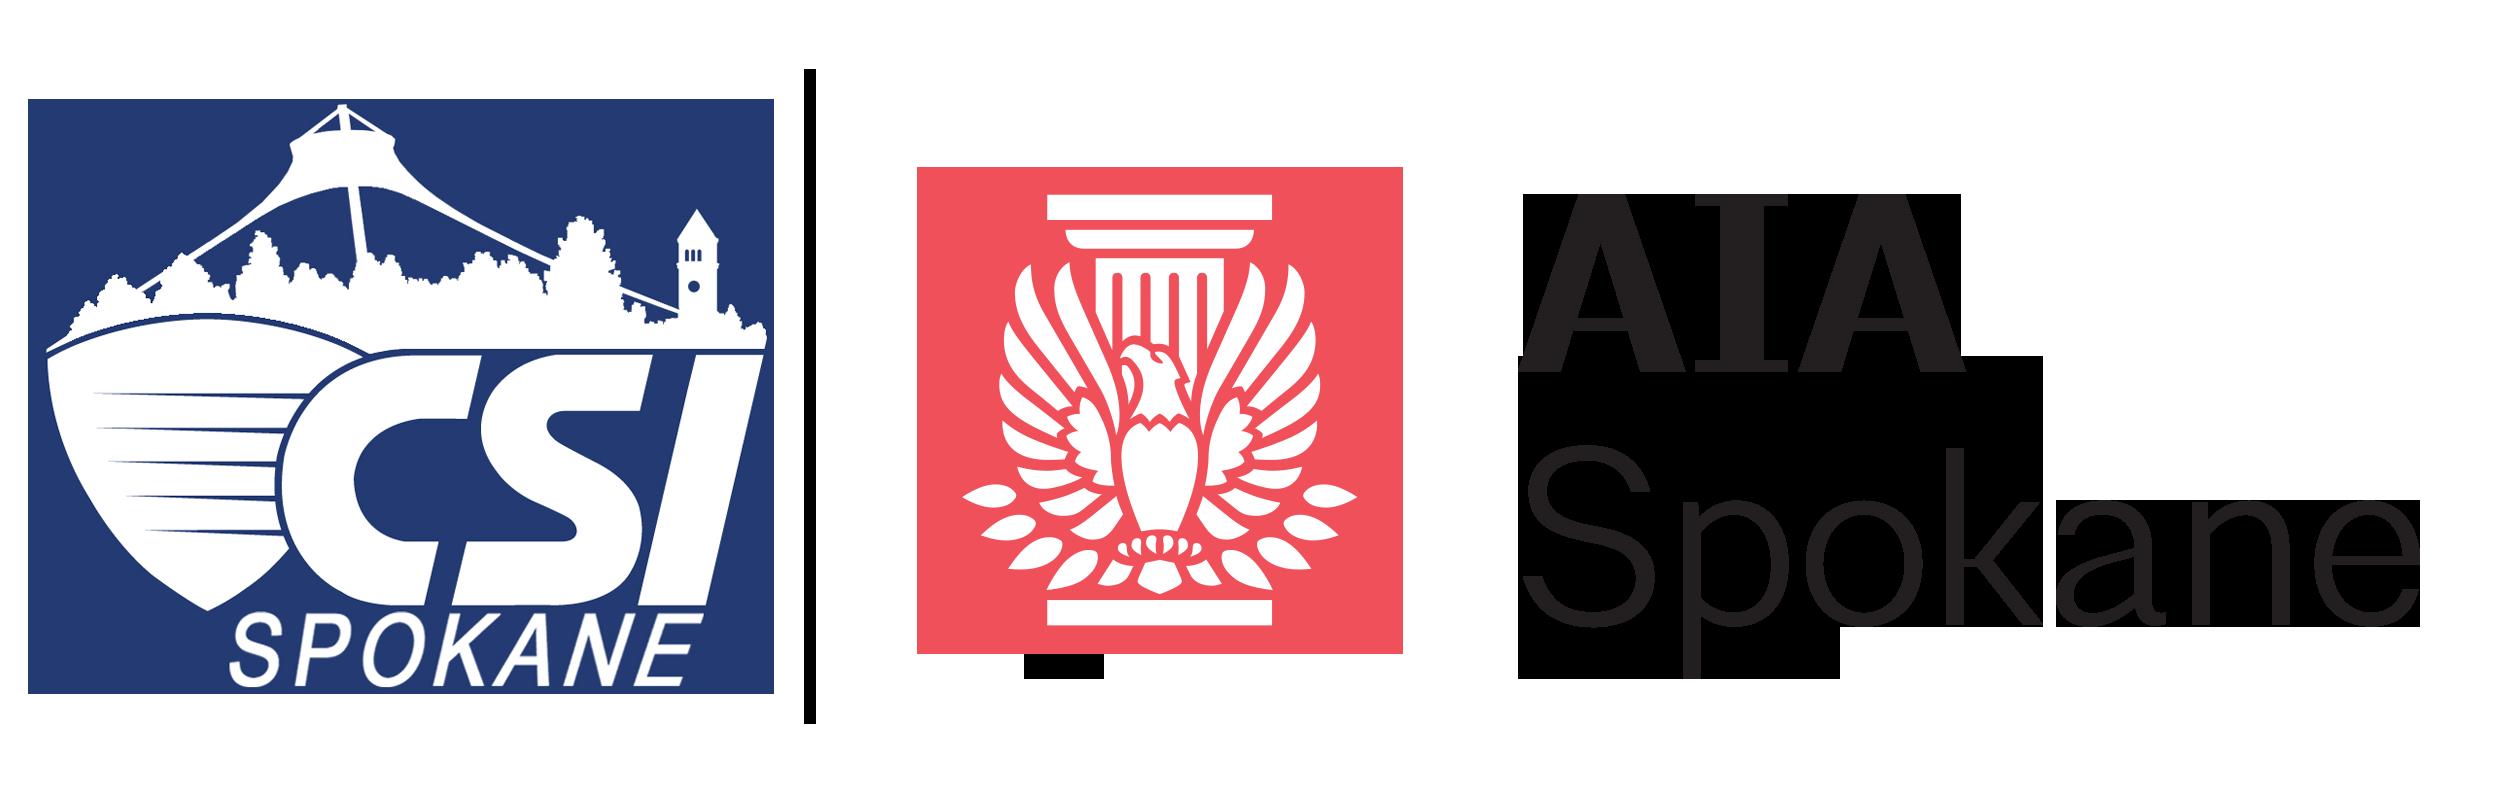 AIA|CSI 2019 Golf Tournament logo